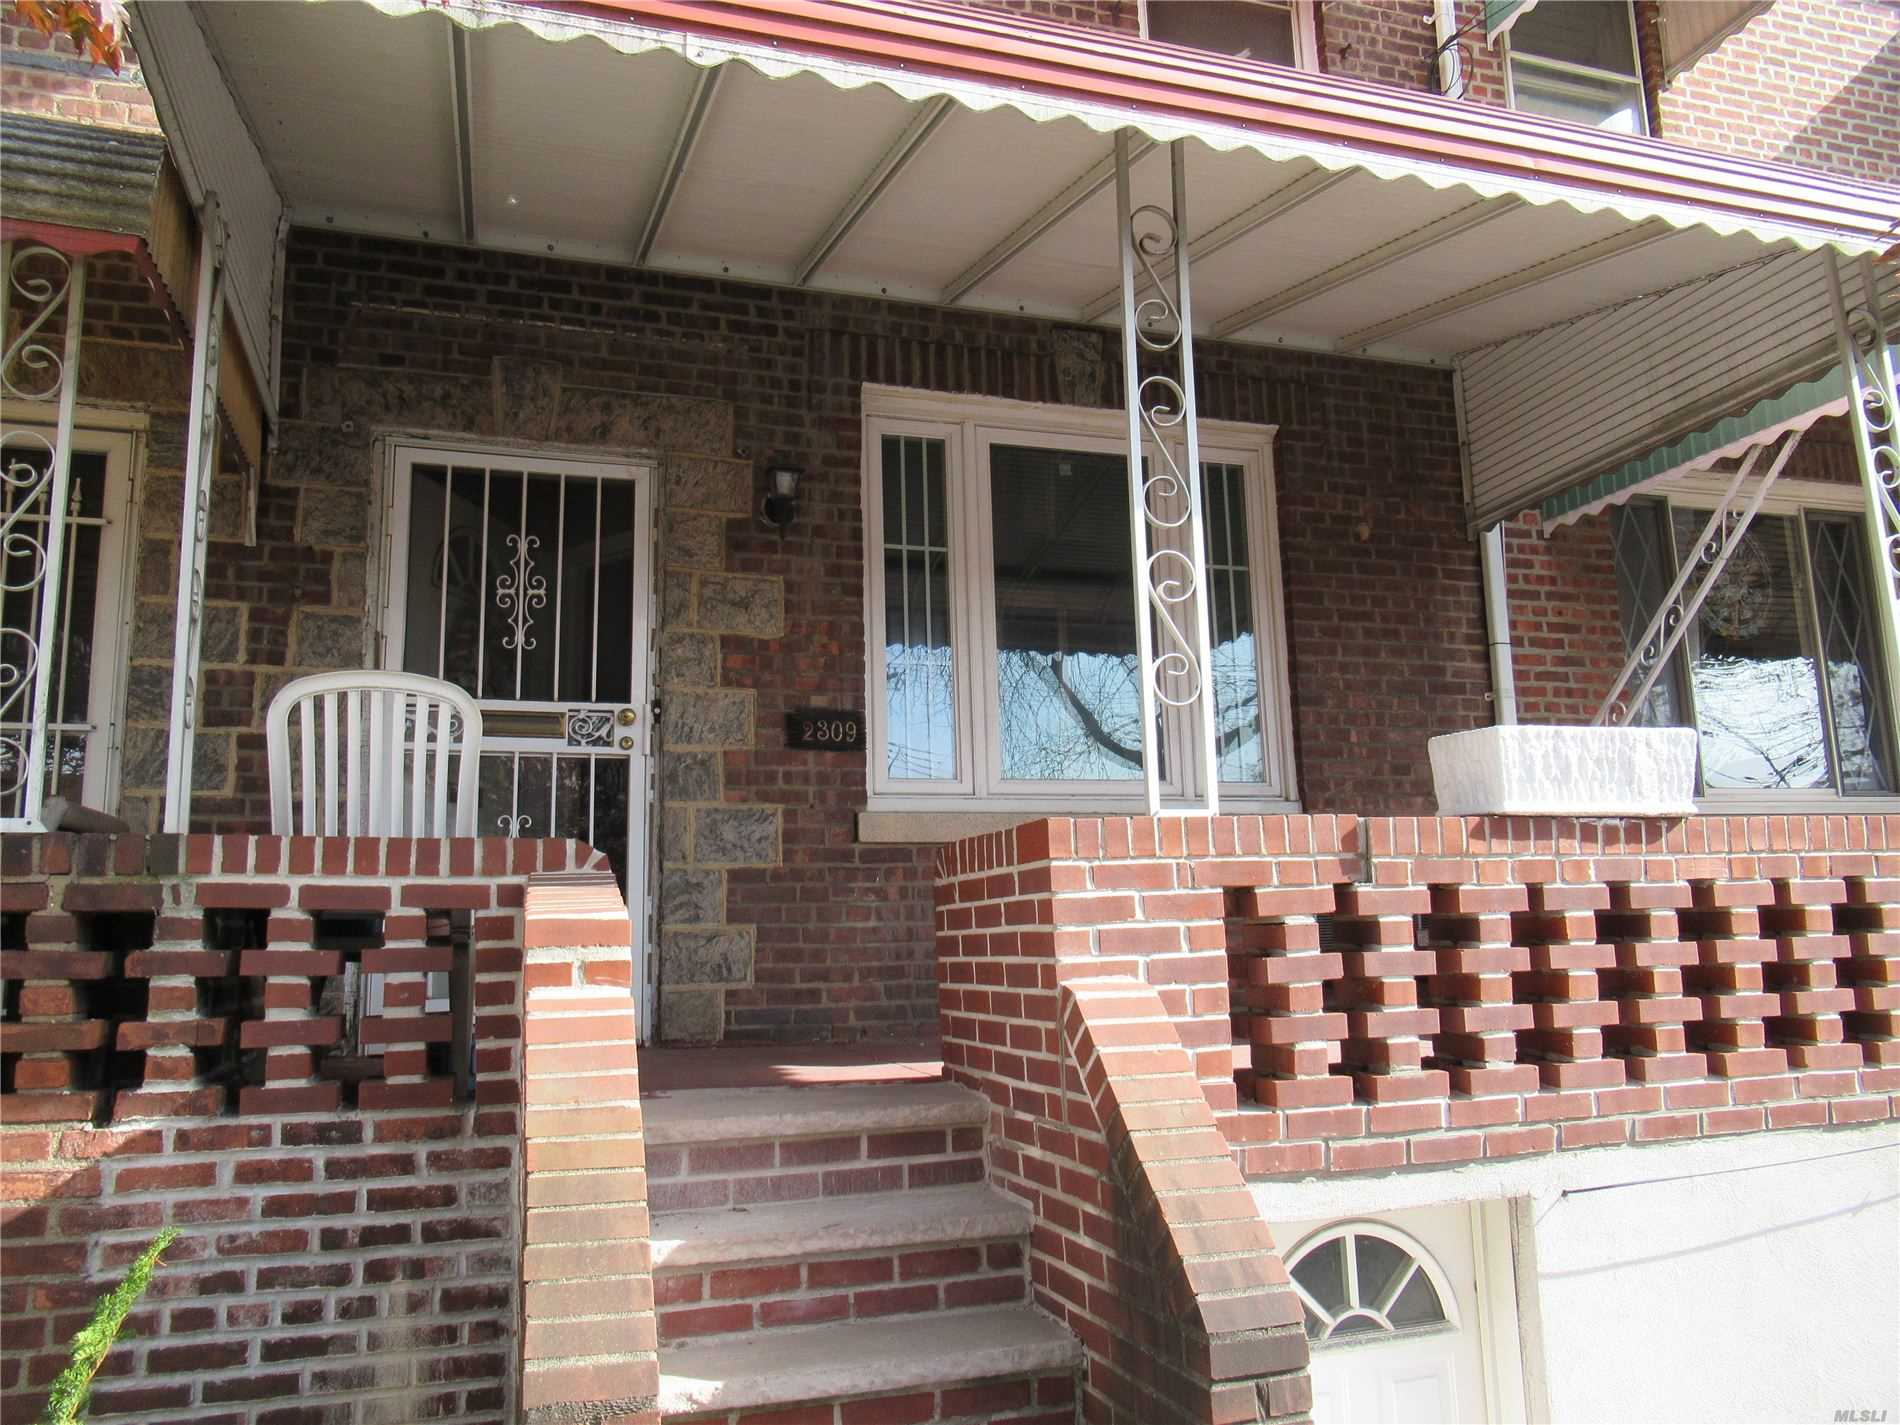 2309 Utica Ave, Brooklyn Flatlands, New York